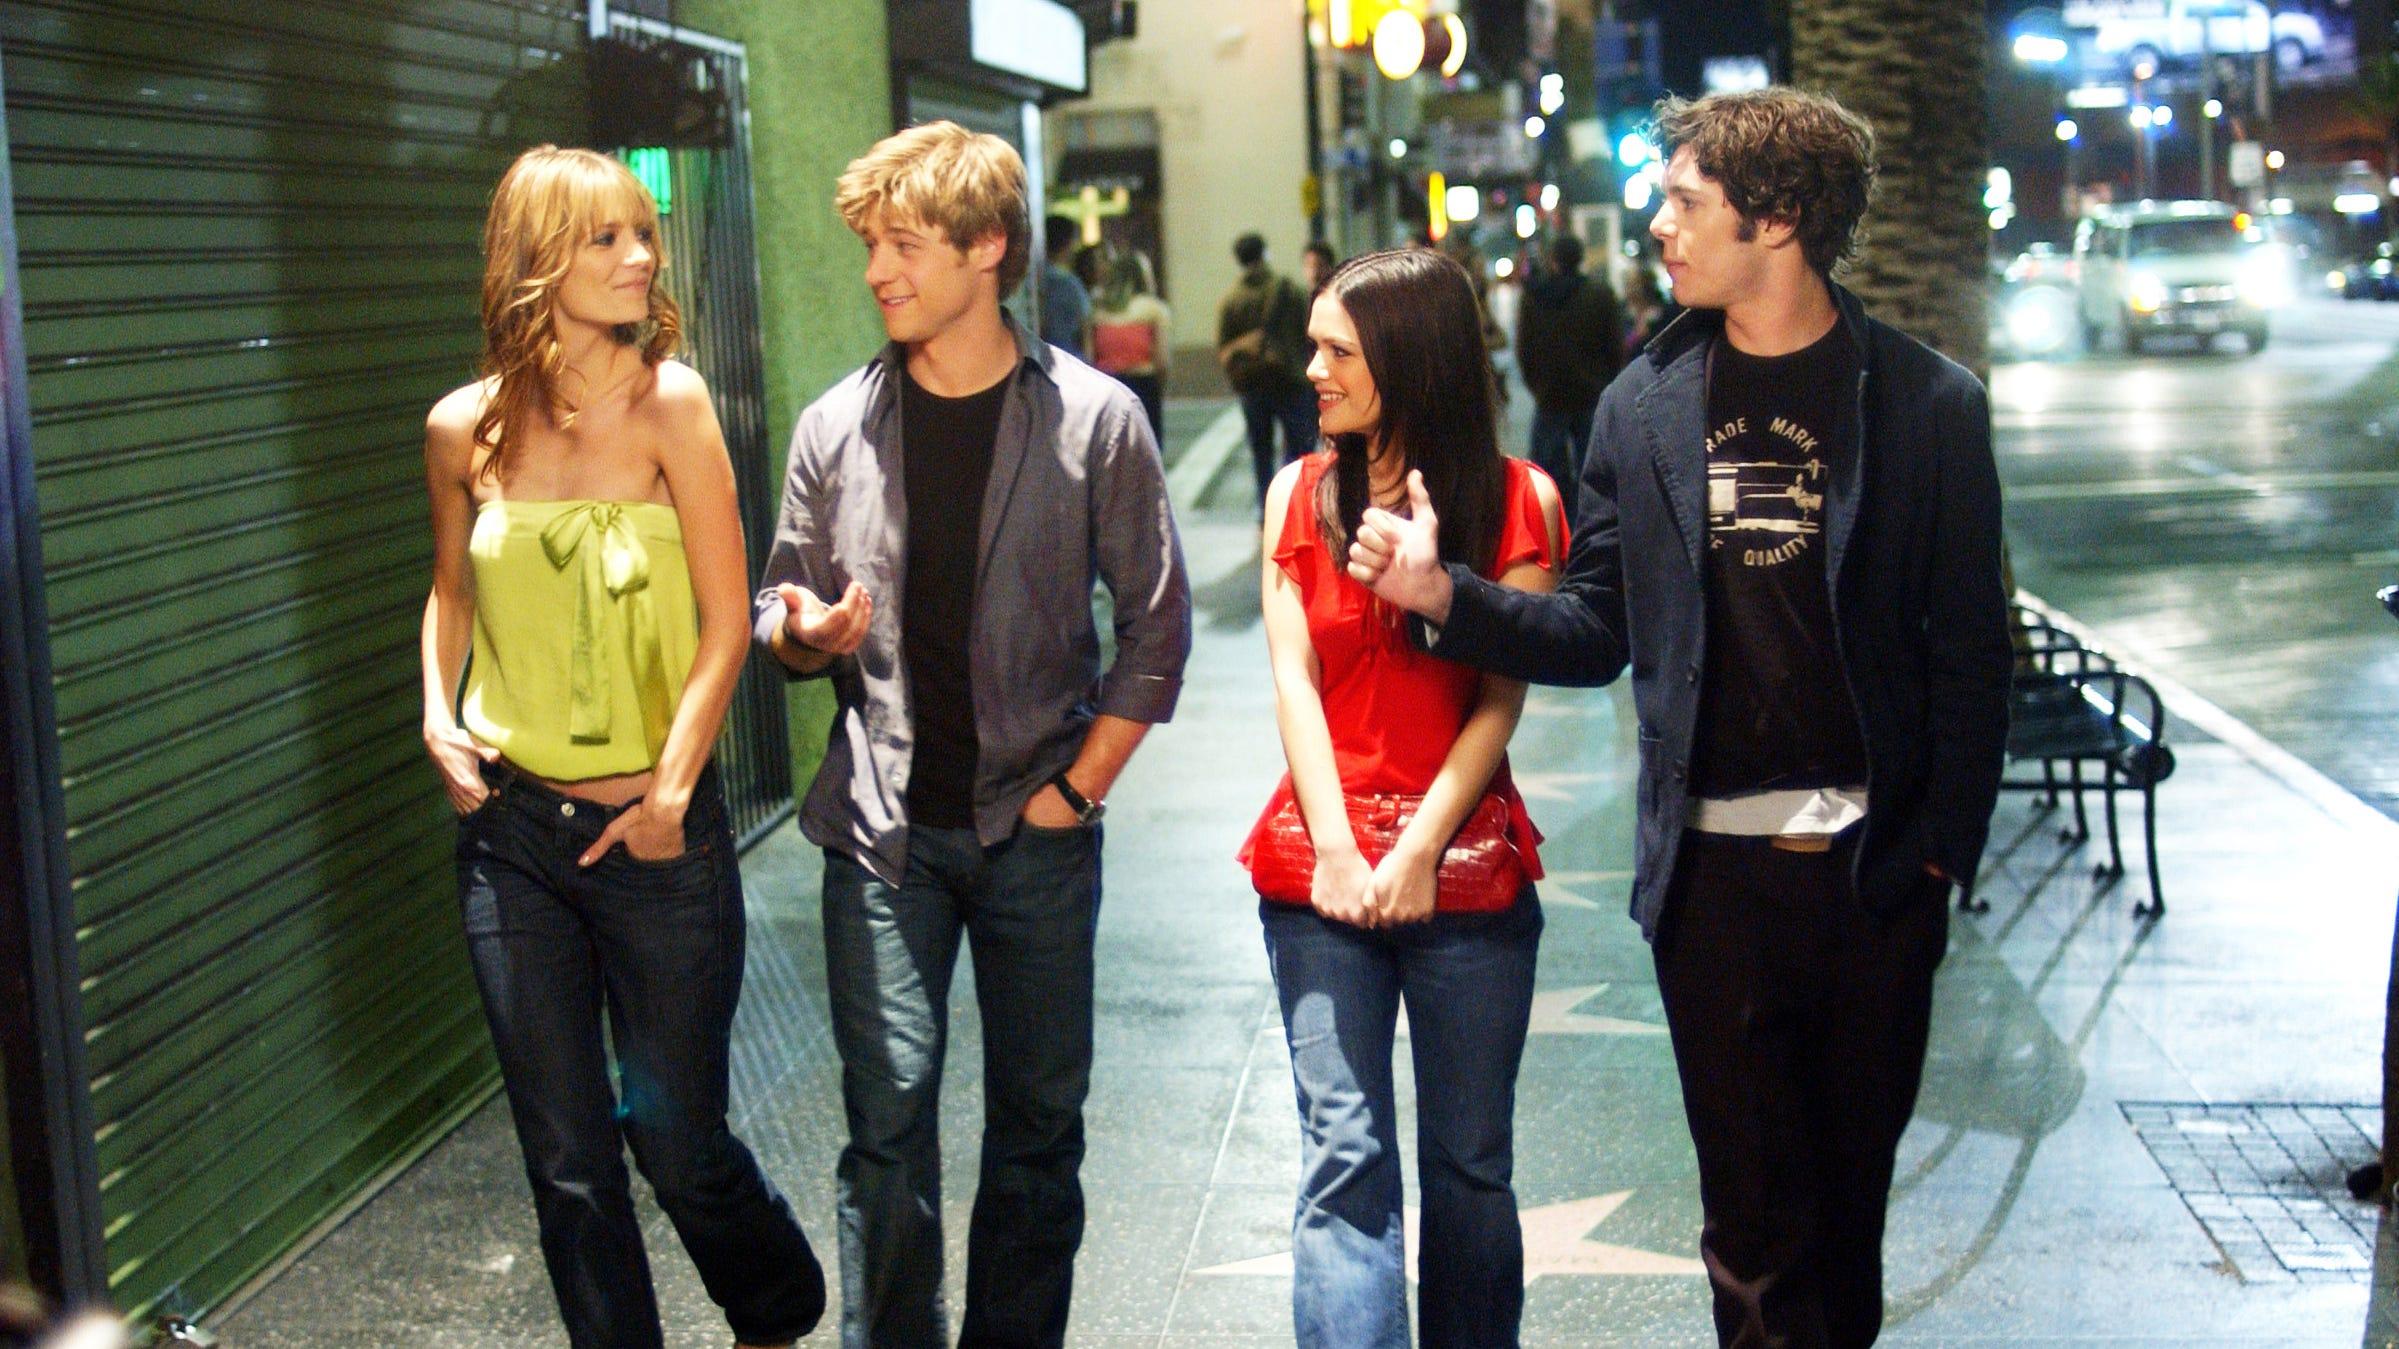 Marissa Cooper (Mischa Barton) often paired strapless tops with jeans.